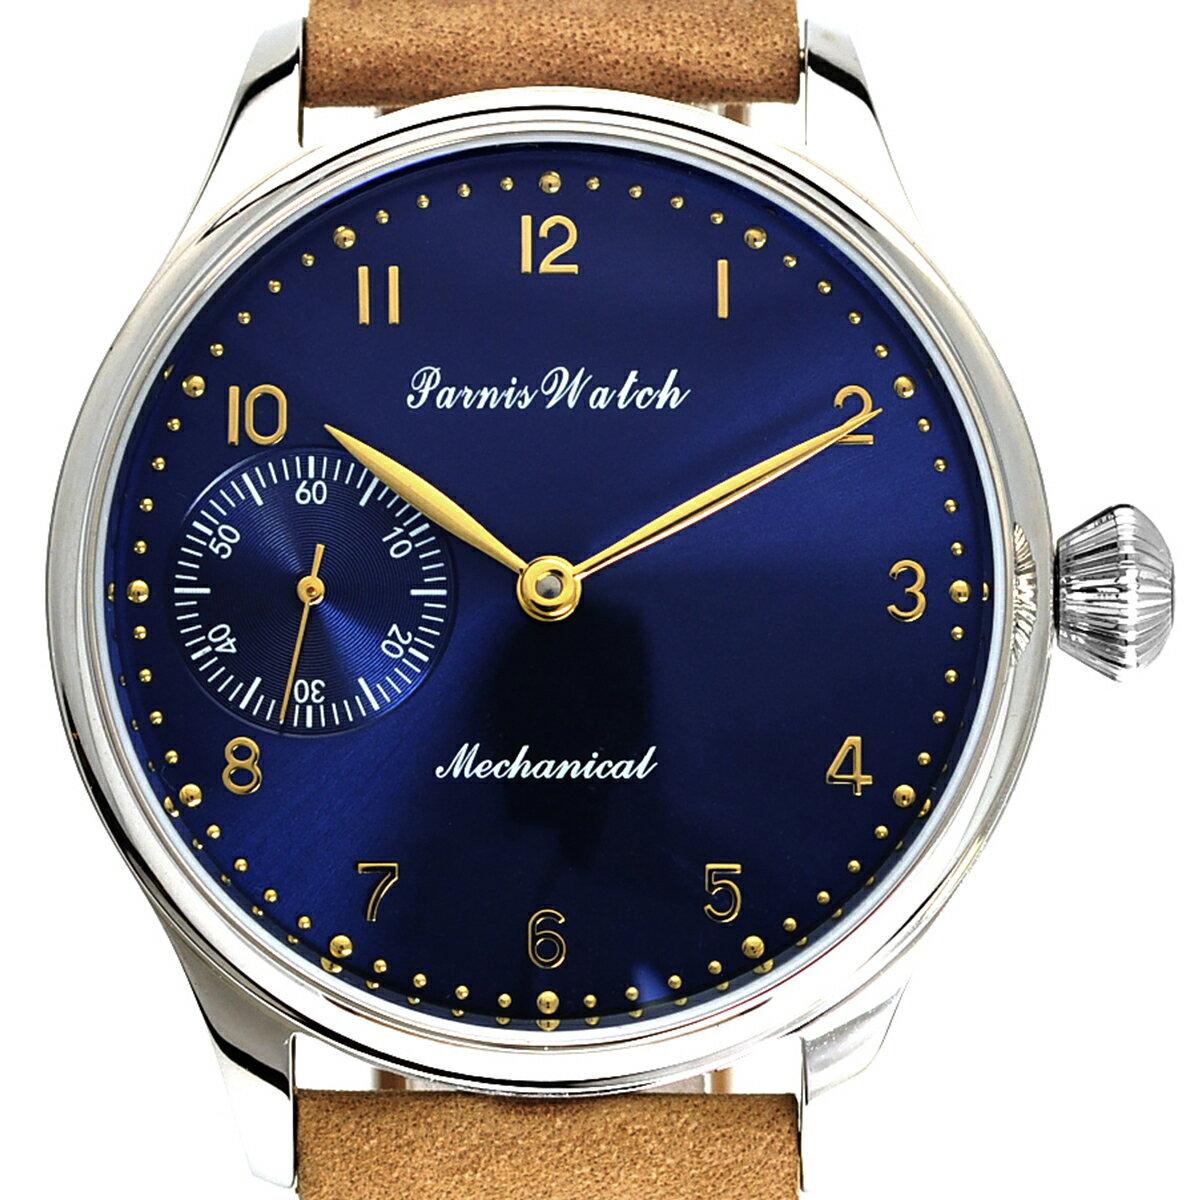 【NEW】PARNIS パーニス 手巻き 腕時計 [PA6061-S3M-BL] 並行輸入品 純正ケース メーカー保証12ヶ月